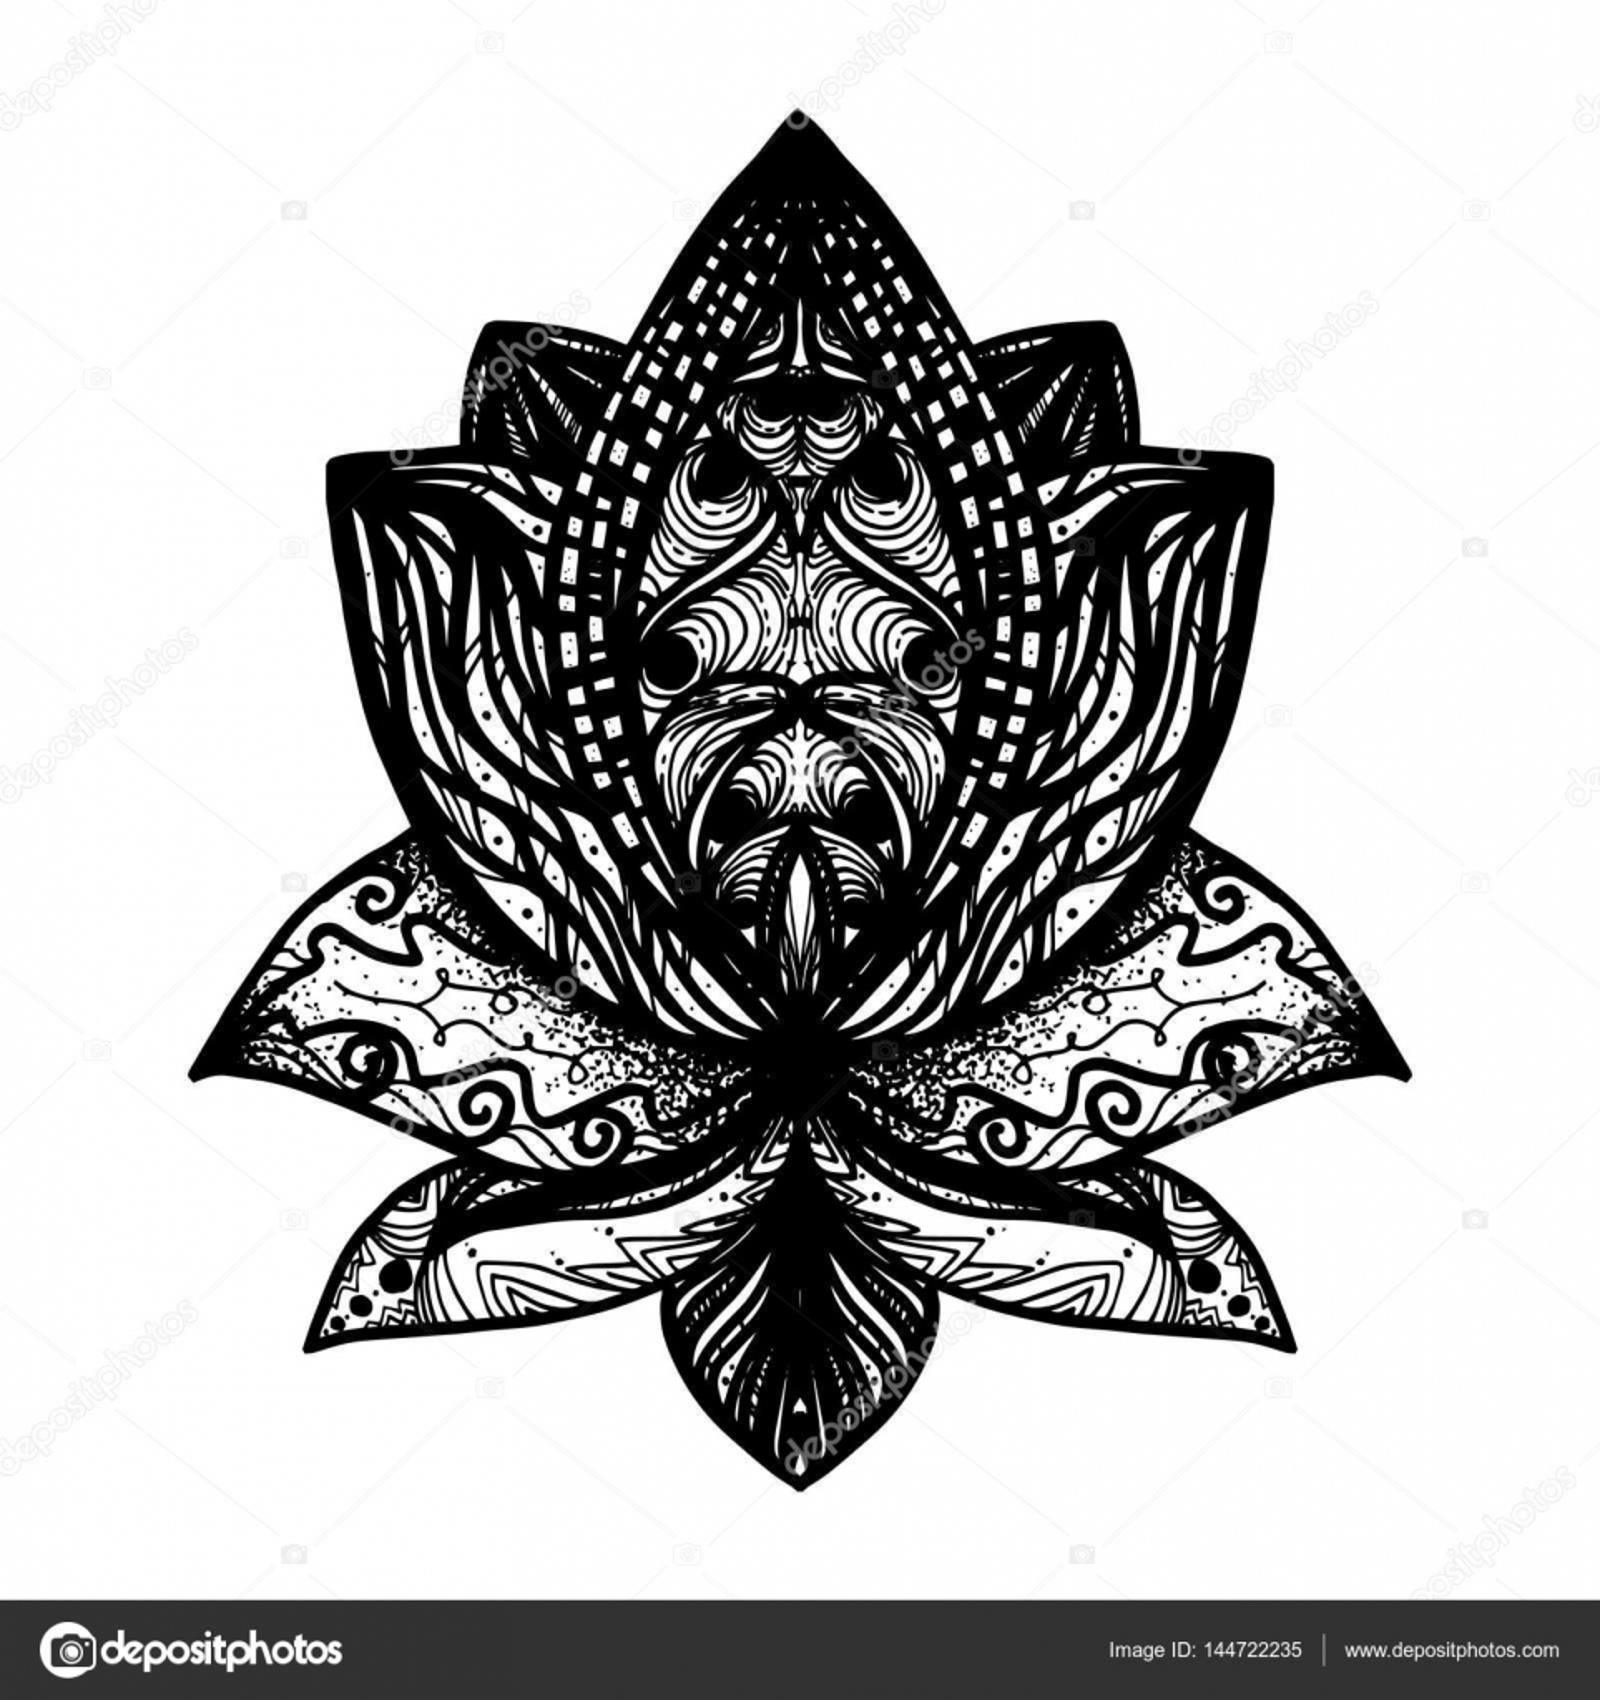 Flower lotus tattoo stock vector barsrsind 144722235 flower lotus magic symbol for print tattoo coloring bookfabric t shirt cloth in boho style tribal lotus design vector vector by barsrsind izmirmasajfo